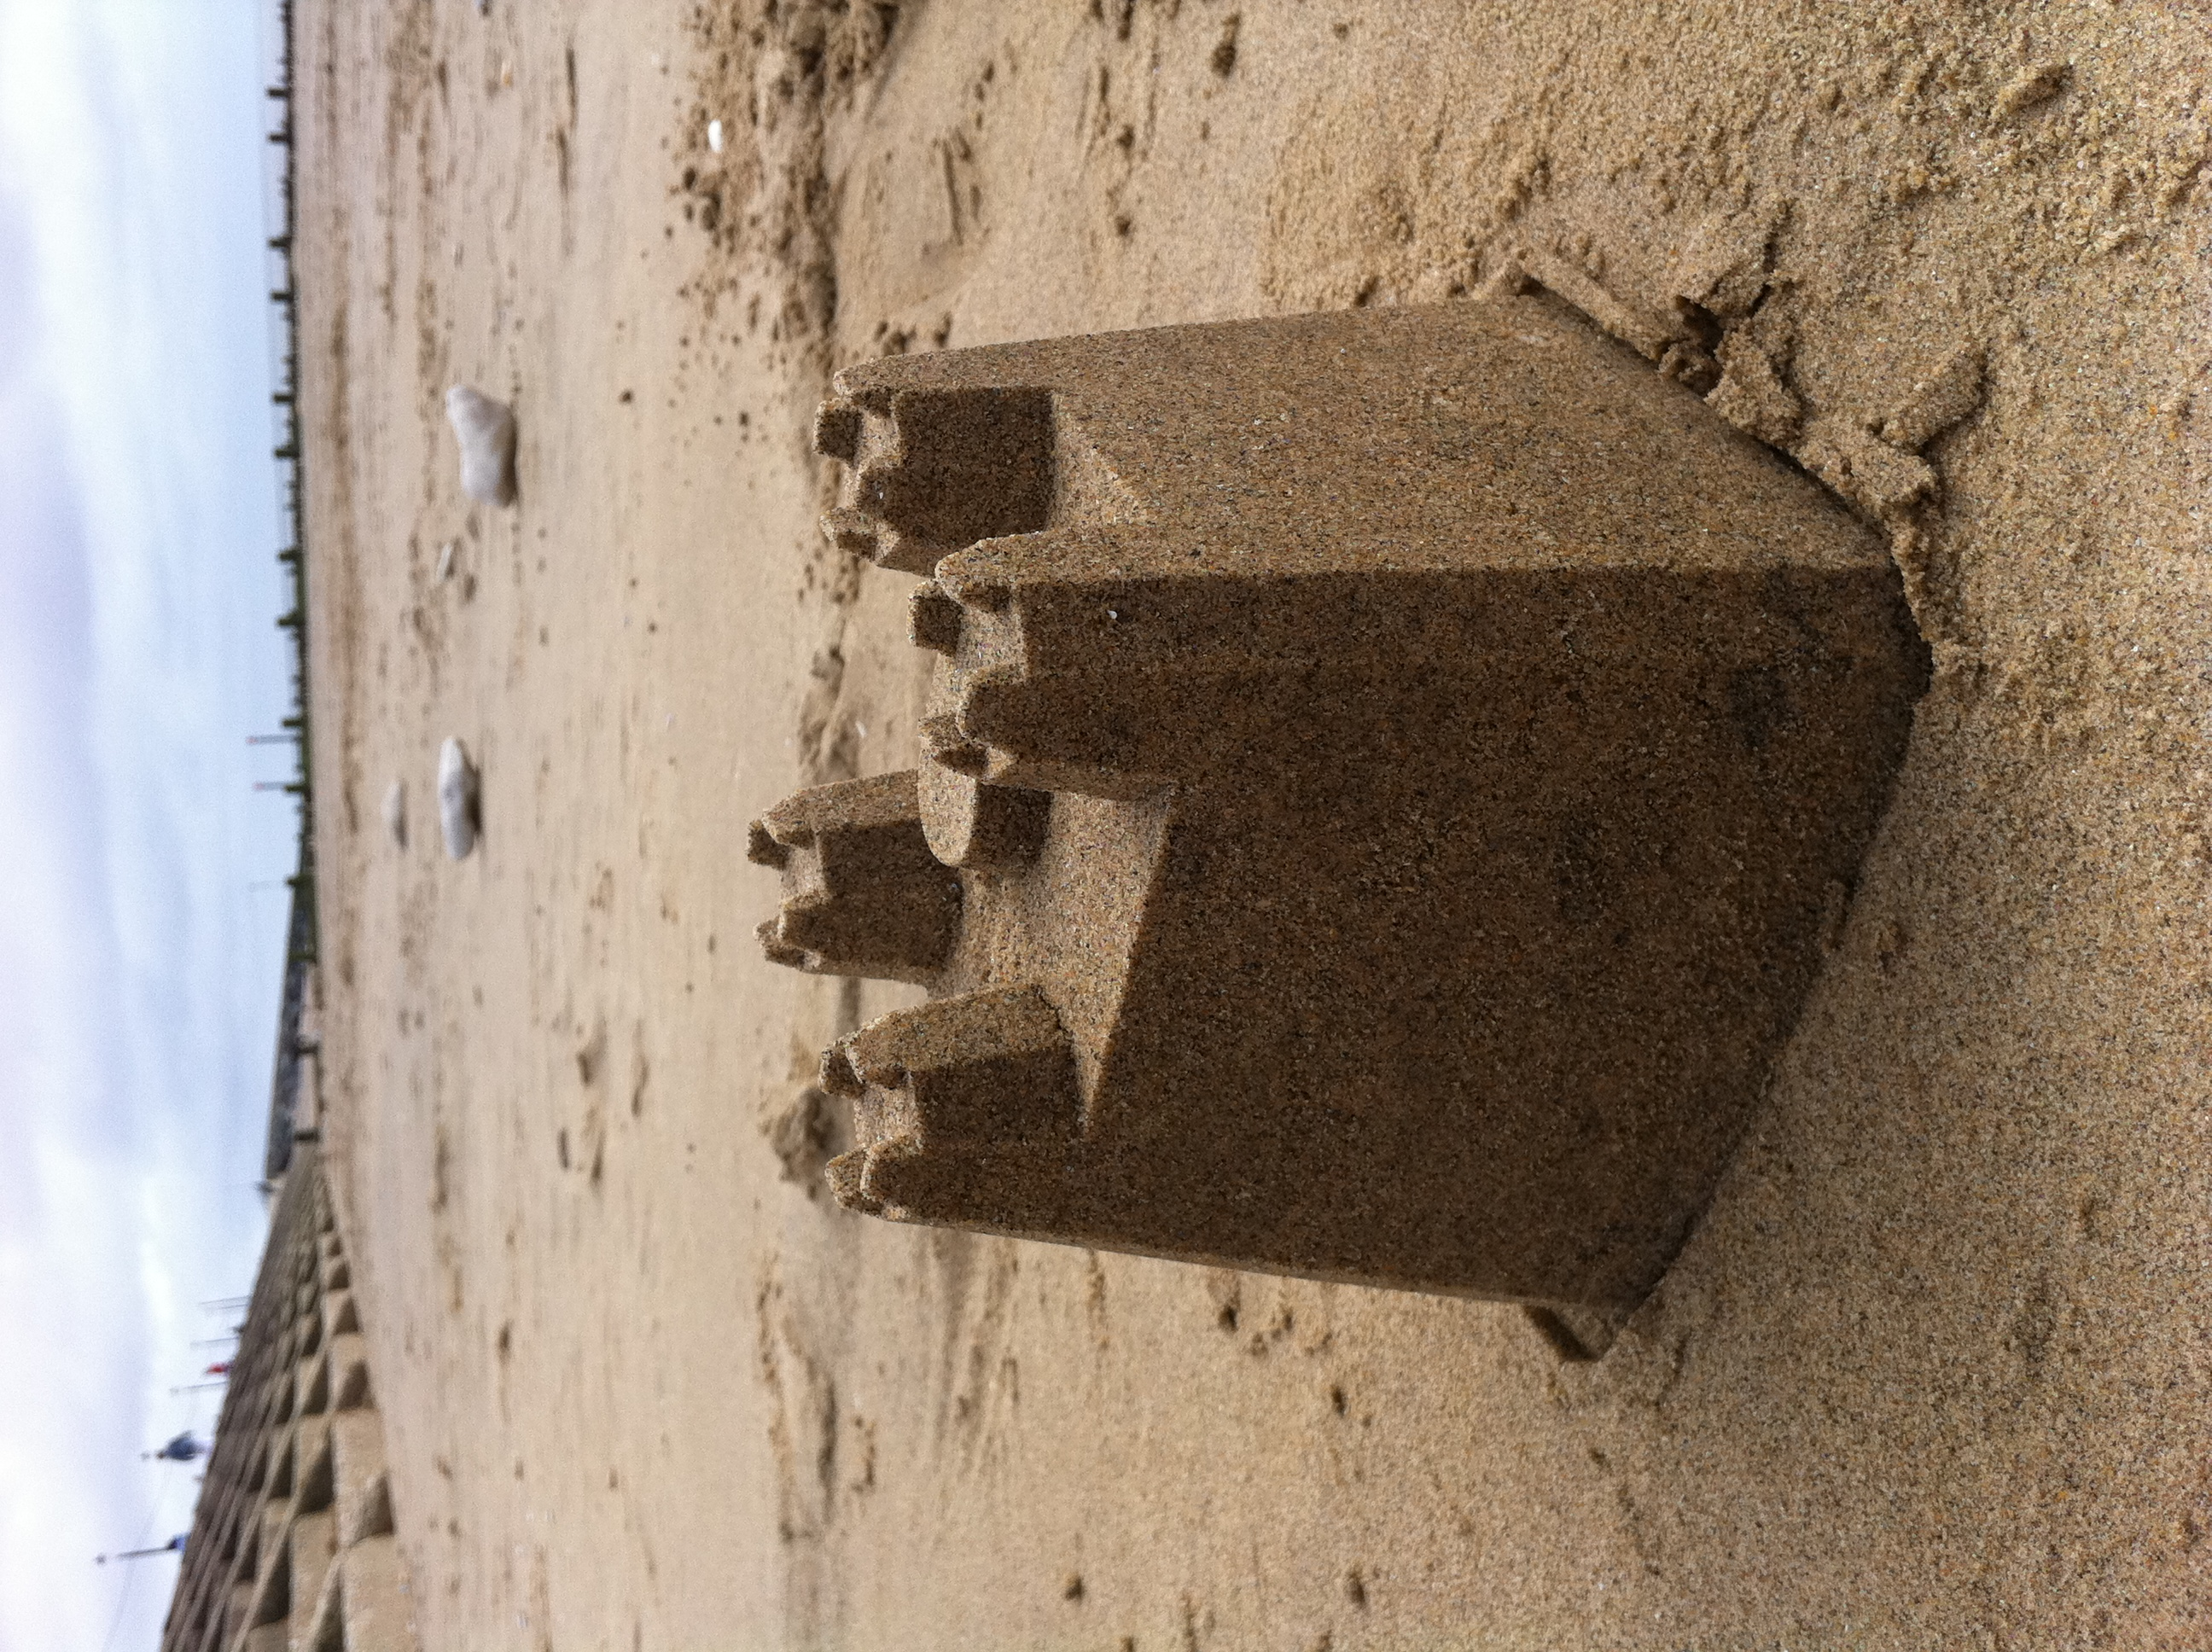 Sandcastle1.jpg